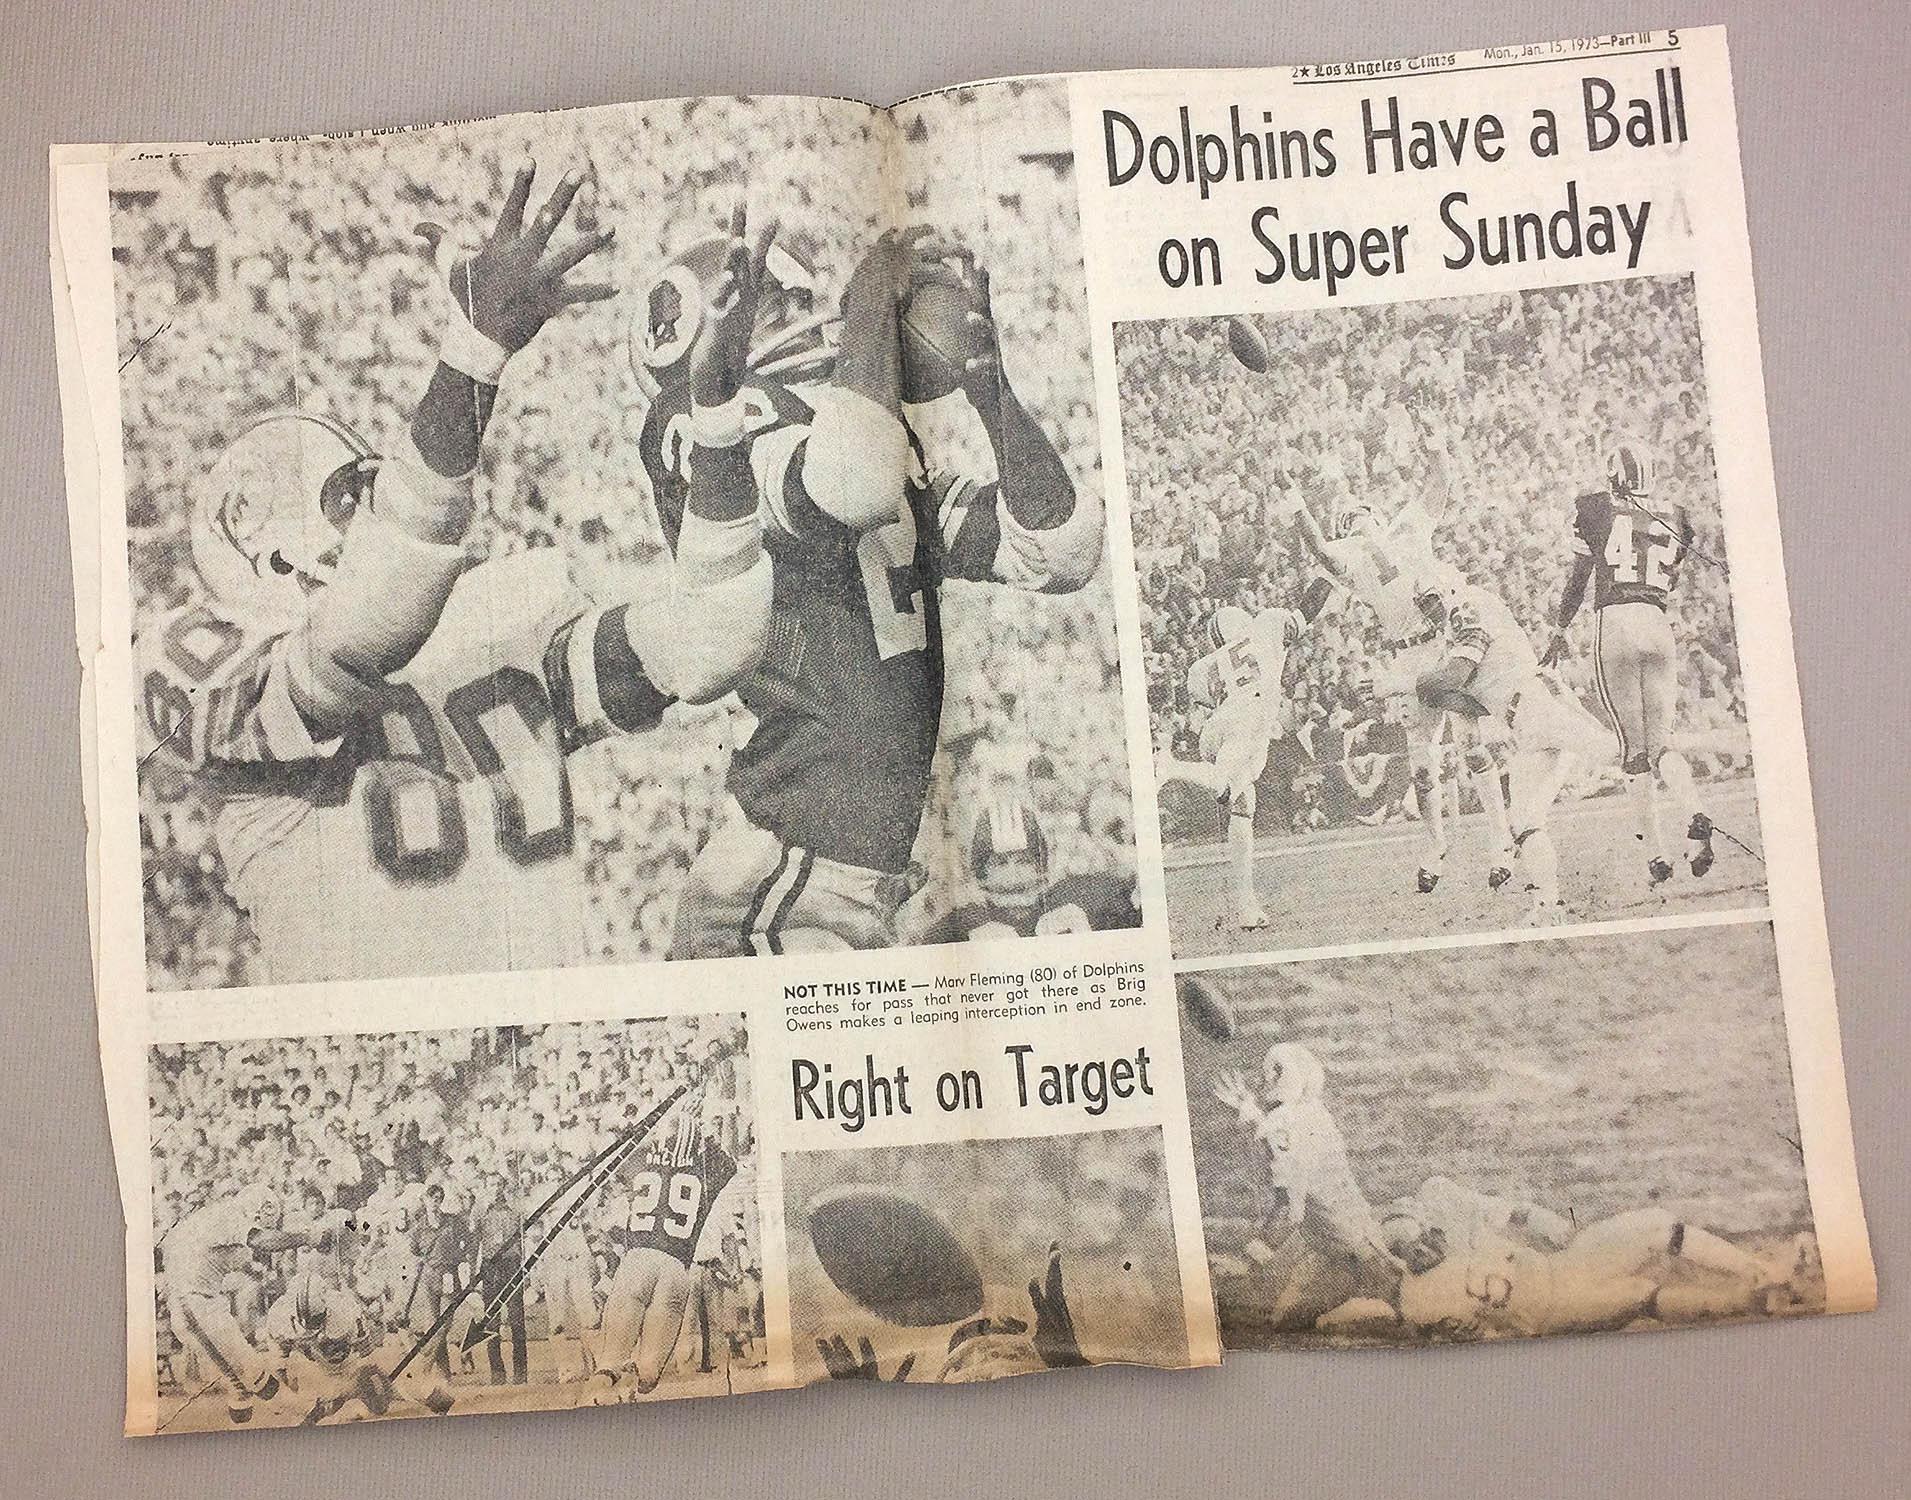 Miami Dolphins 1973 Super Bowl VII